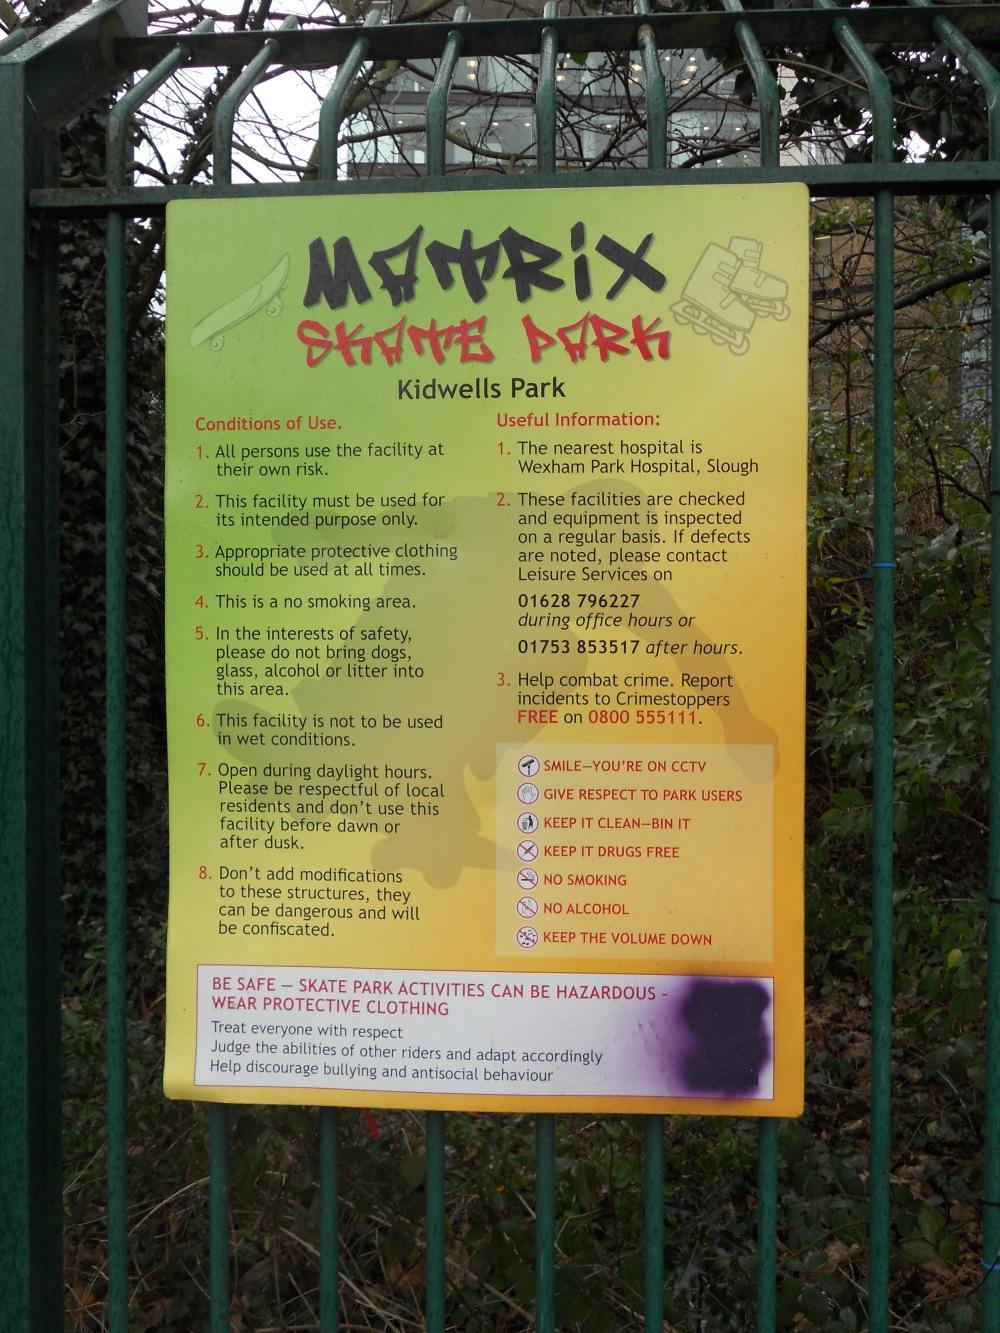 Kidwells Park Matrix Skate Park